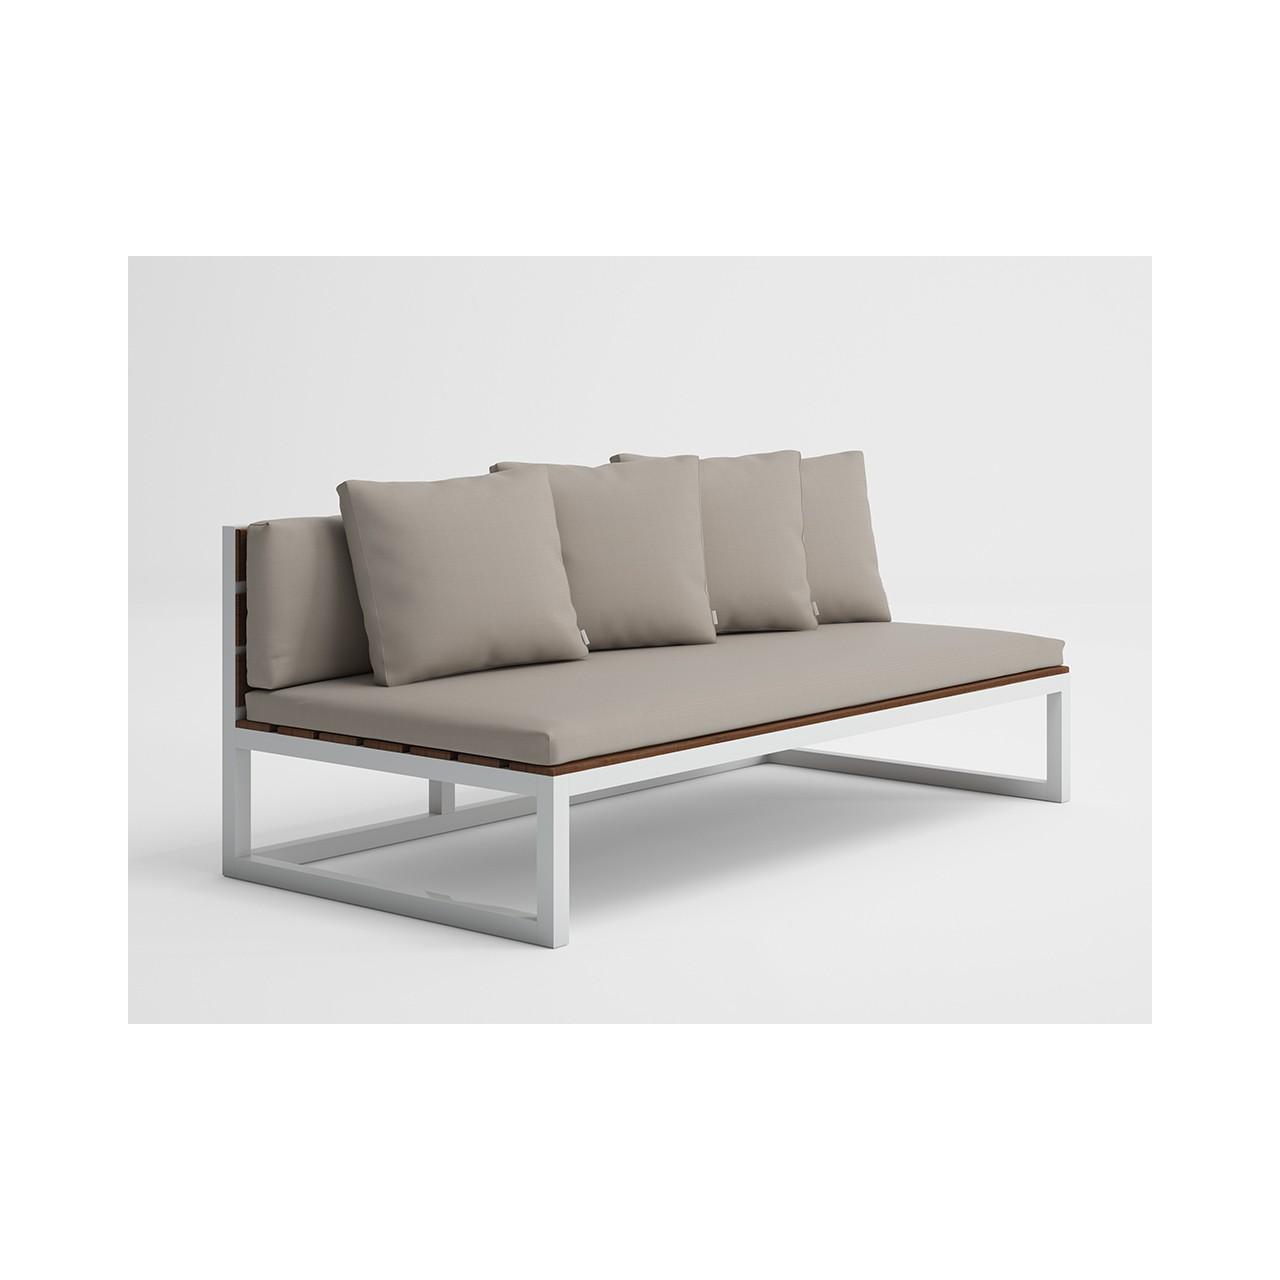 Saler Soft Teak - Modular Sofa 4